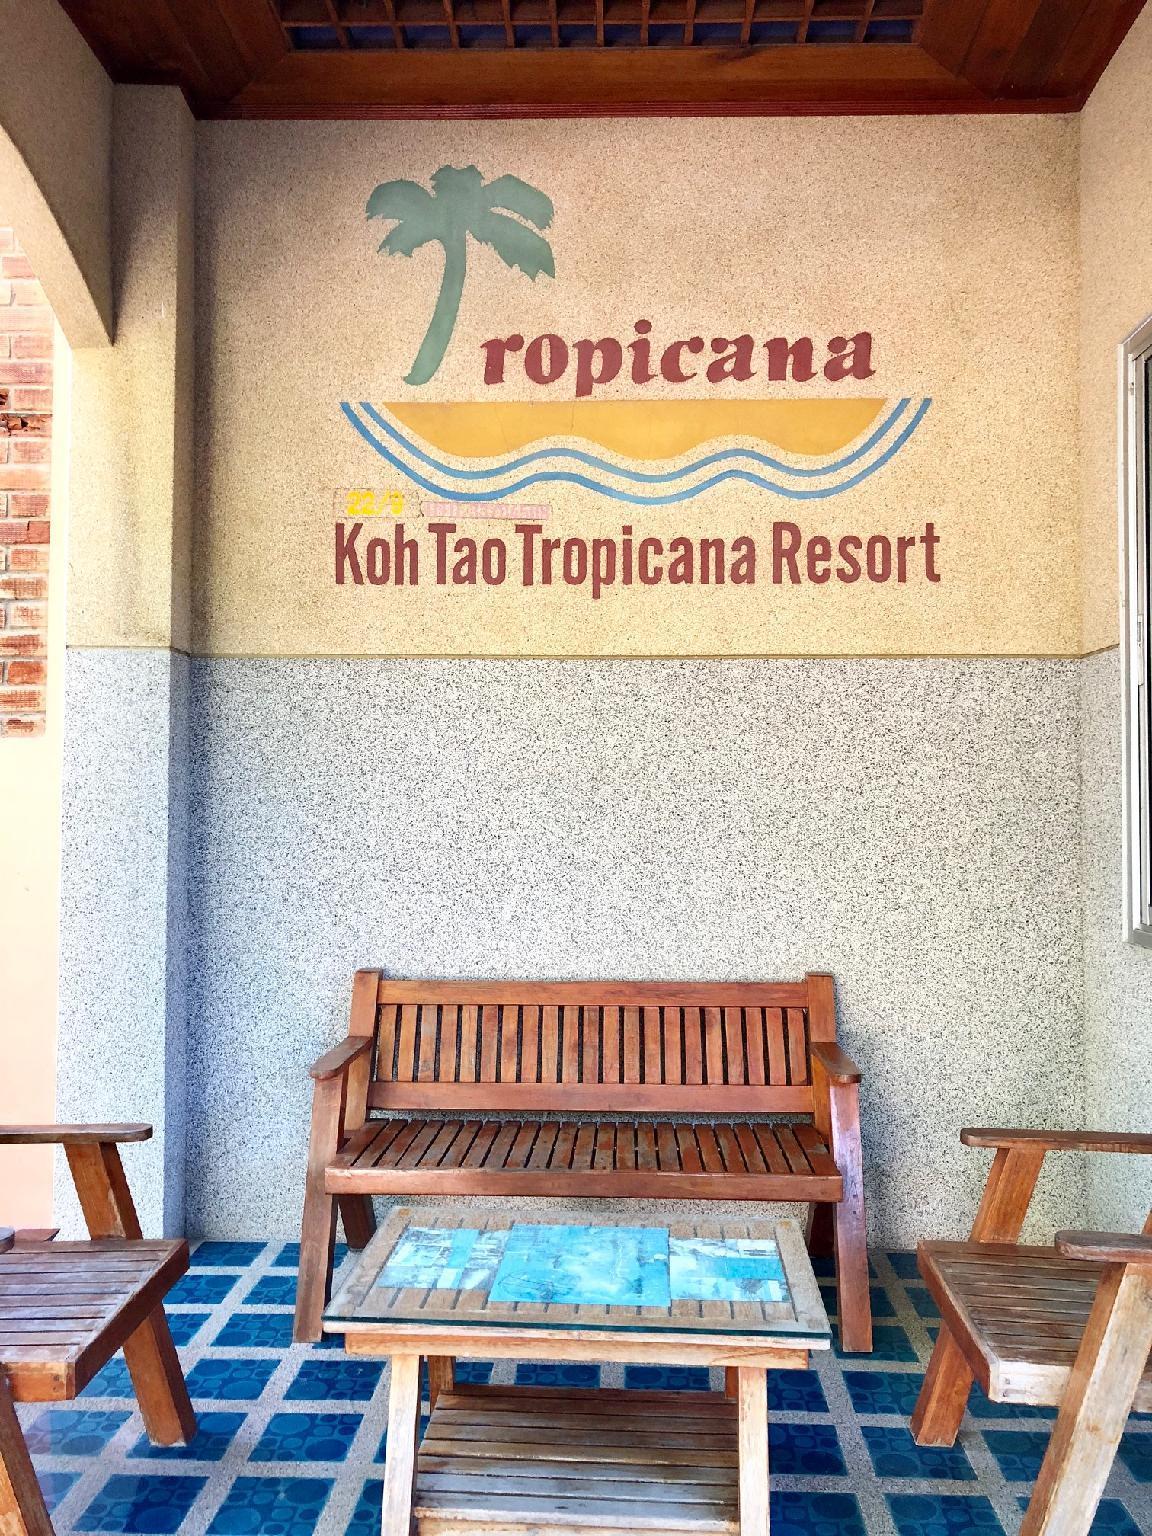 Koh Tao Tropicana Resort